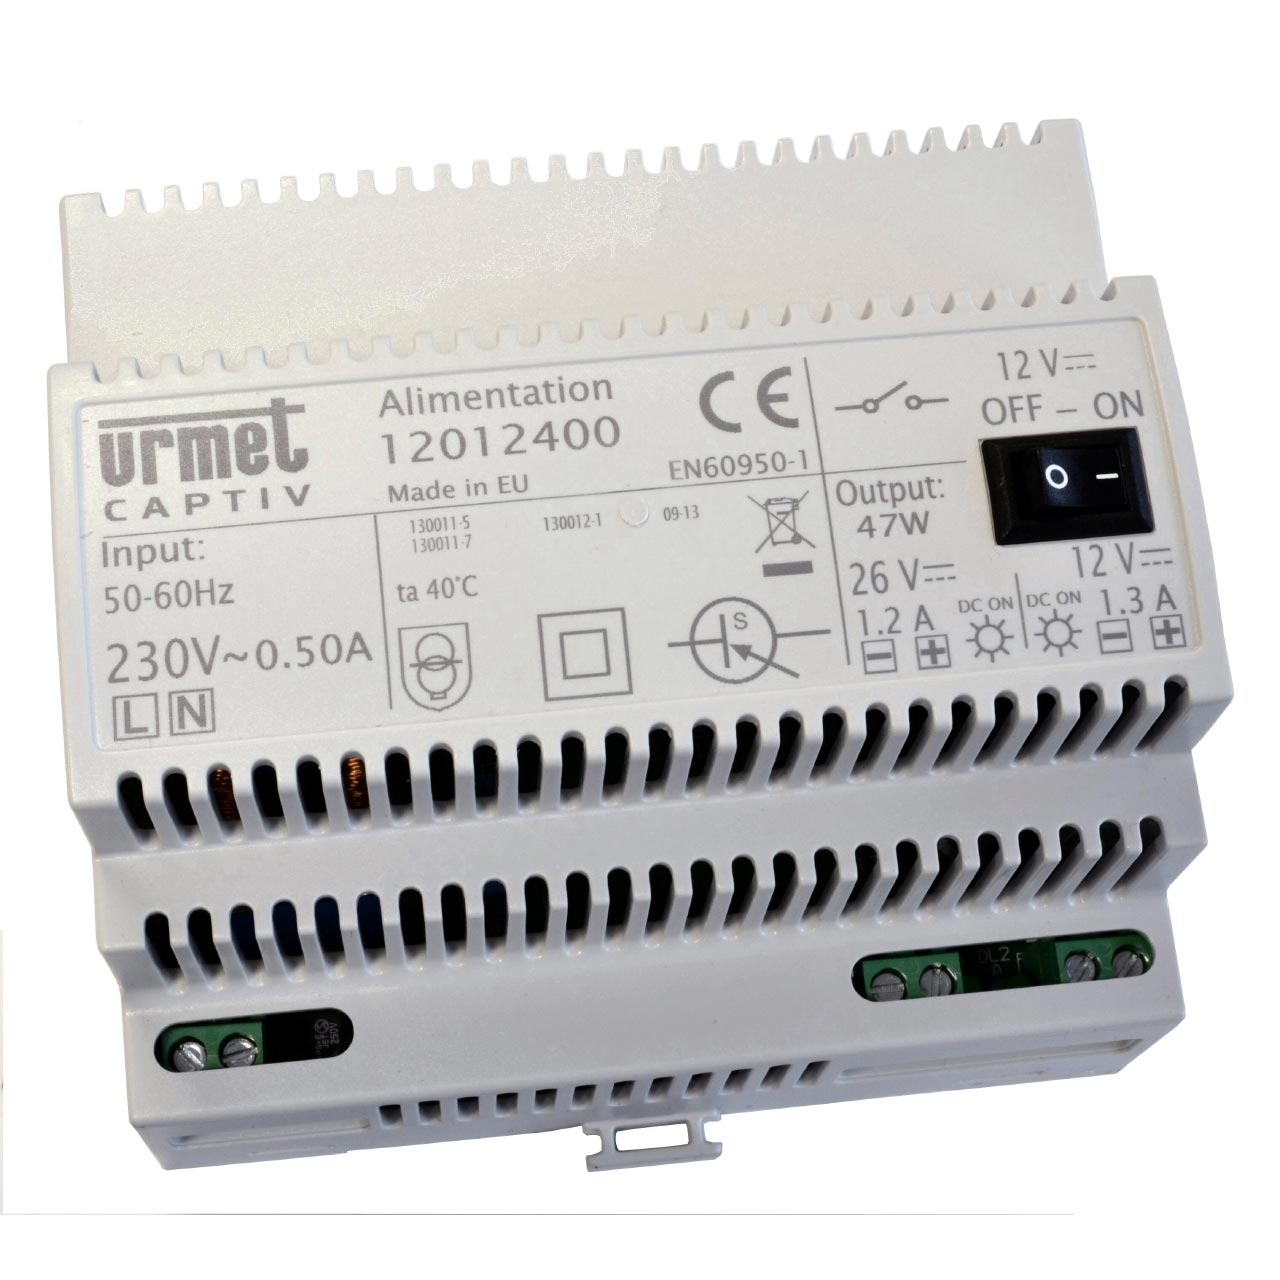 Urmet - URM12012400 - URMET 12012400 - ALIMENTATION OPEN 26VCC-12VCC